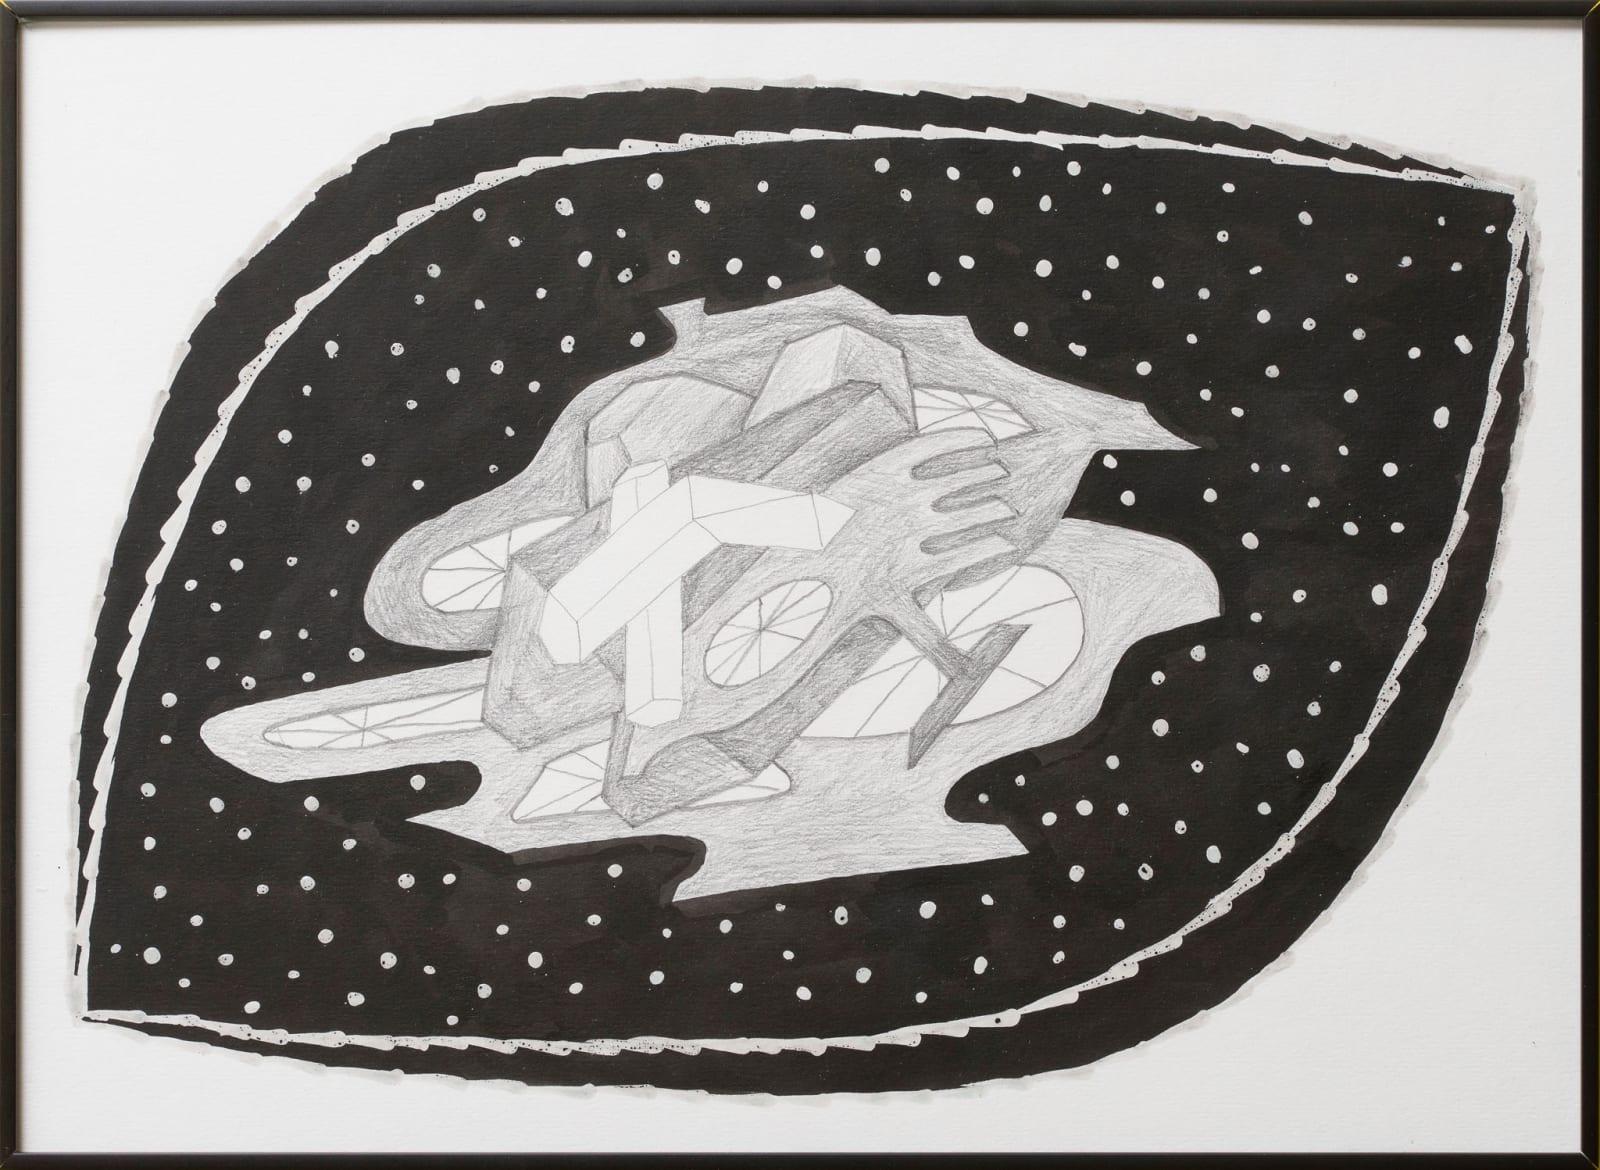 Anna Hulacova, Untitled, 2016, paper, graphite ink, charcoal, wax 31 x 43 x 2 cm